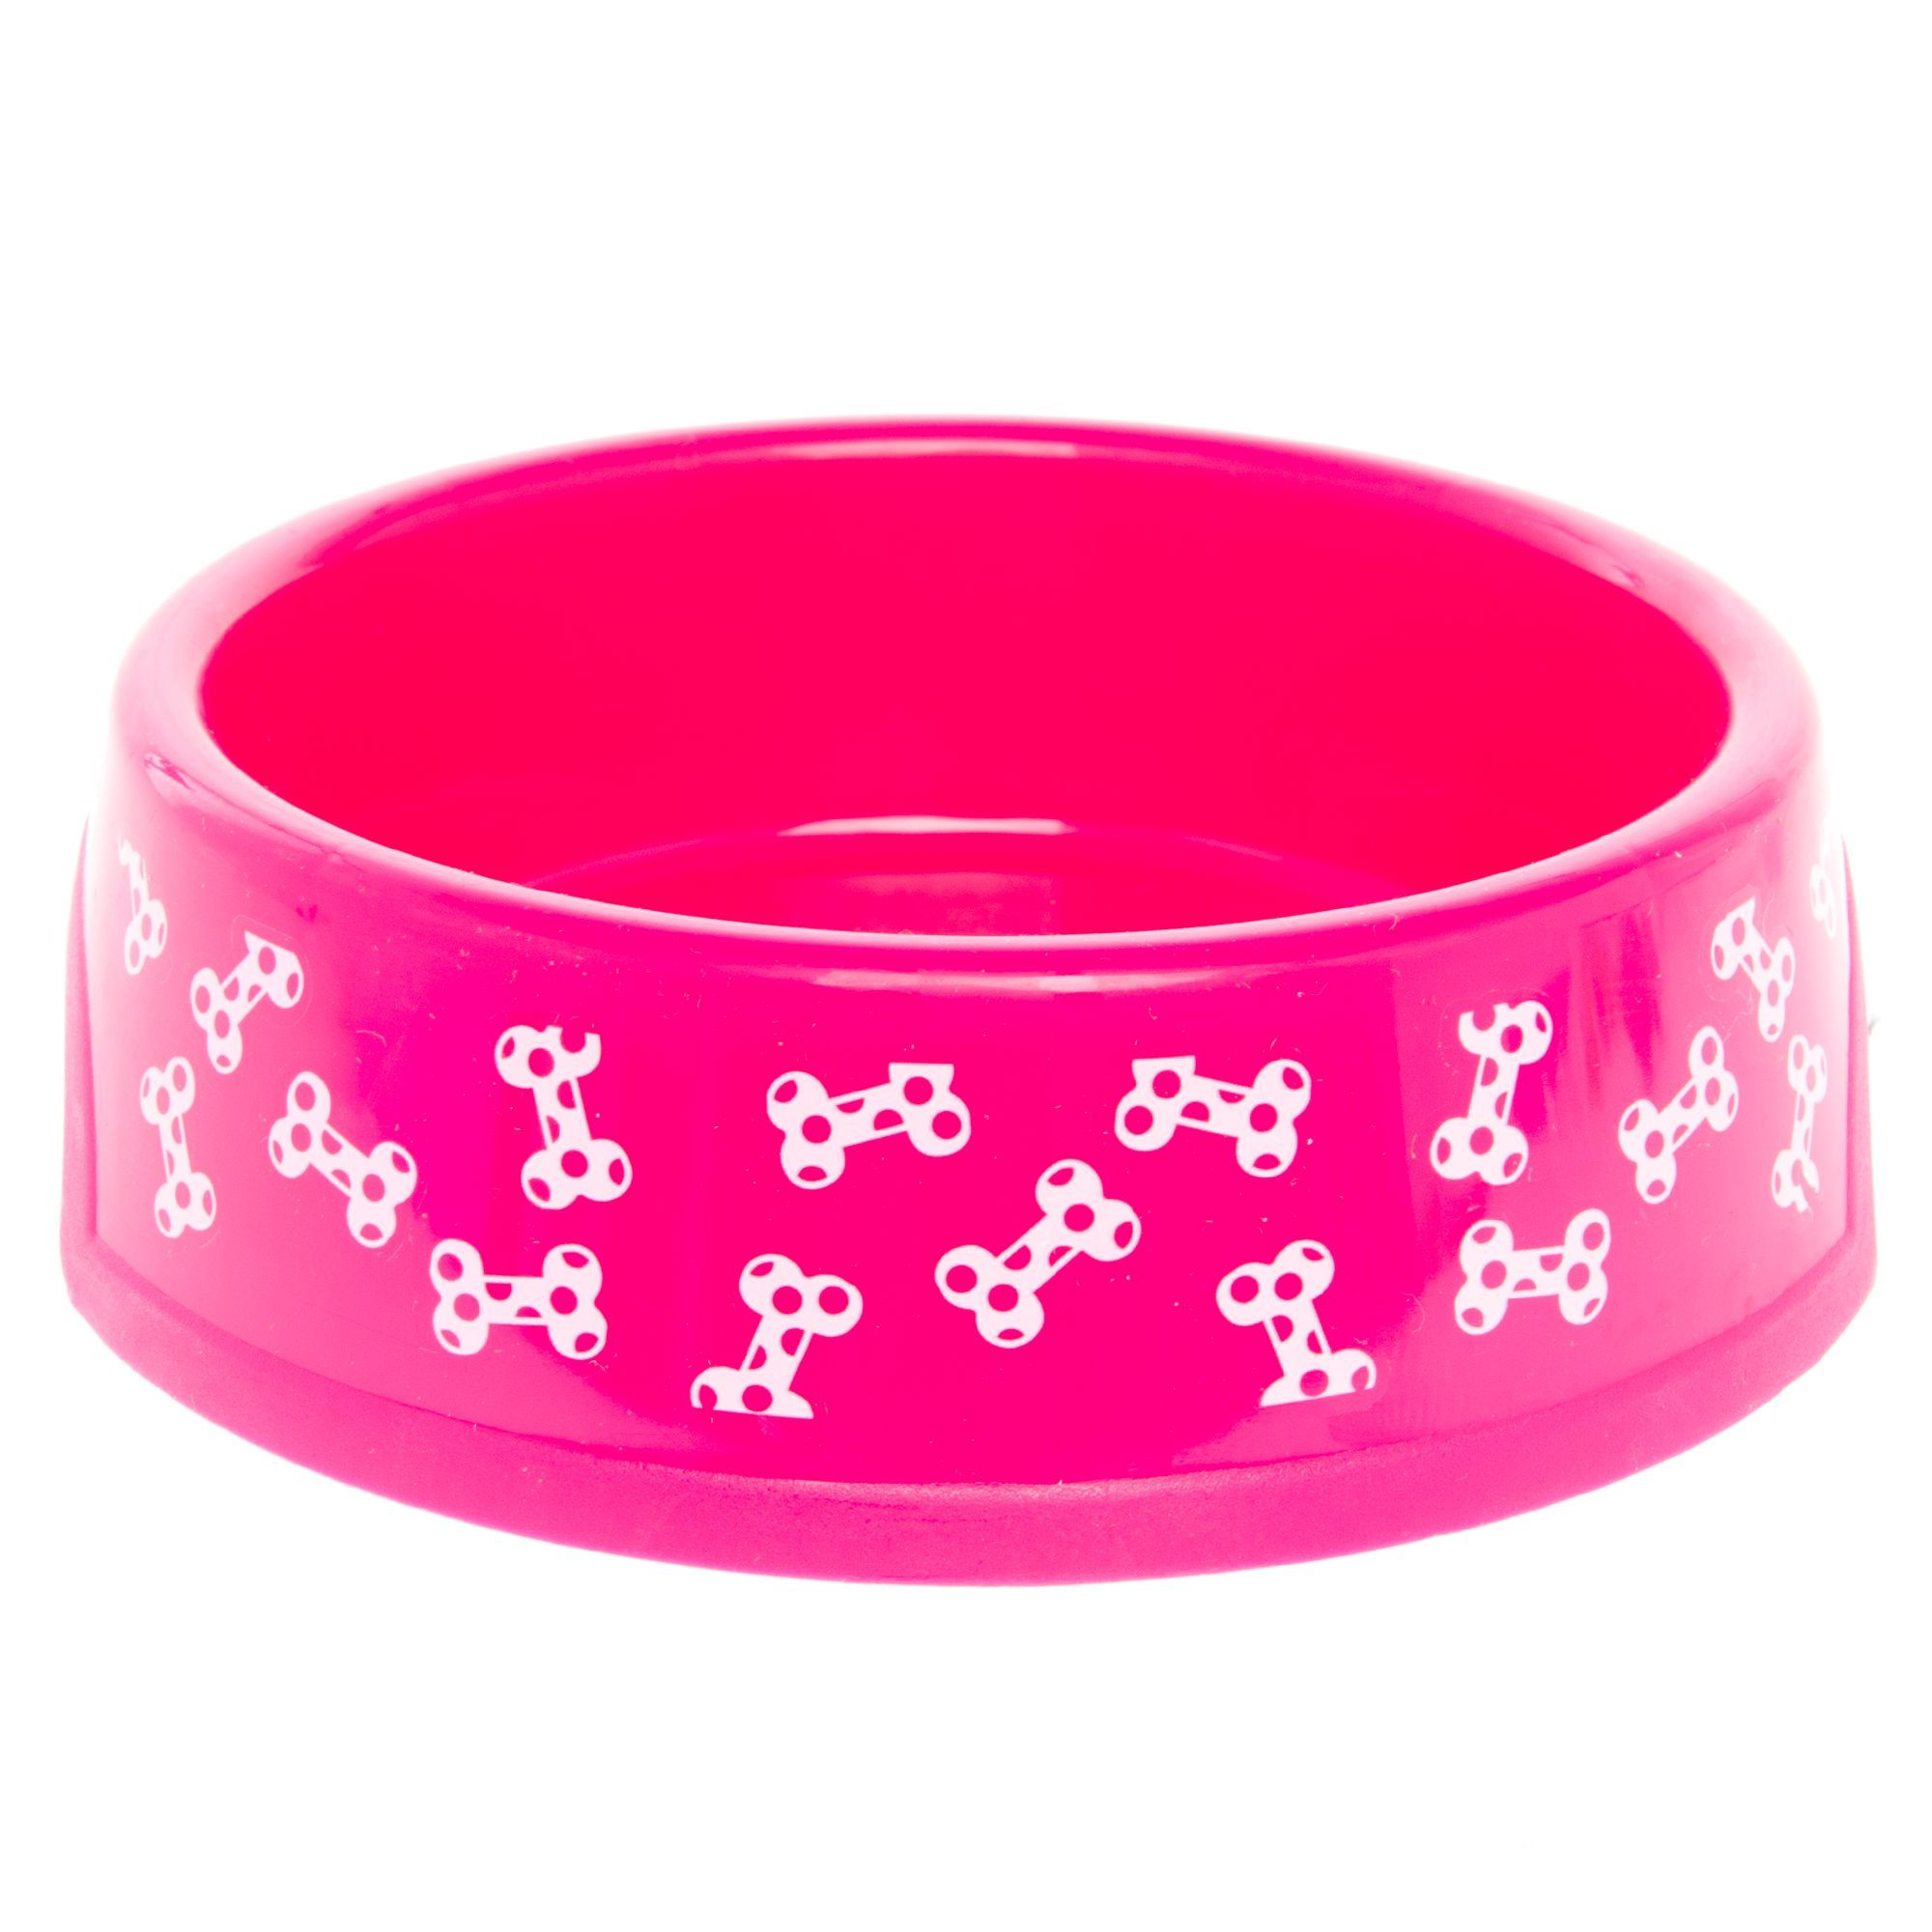 Grreat choice dog bowl size 125 pt pink plastic dog